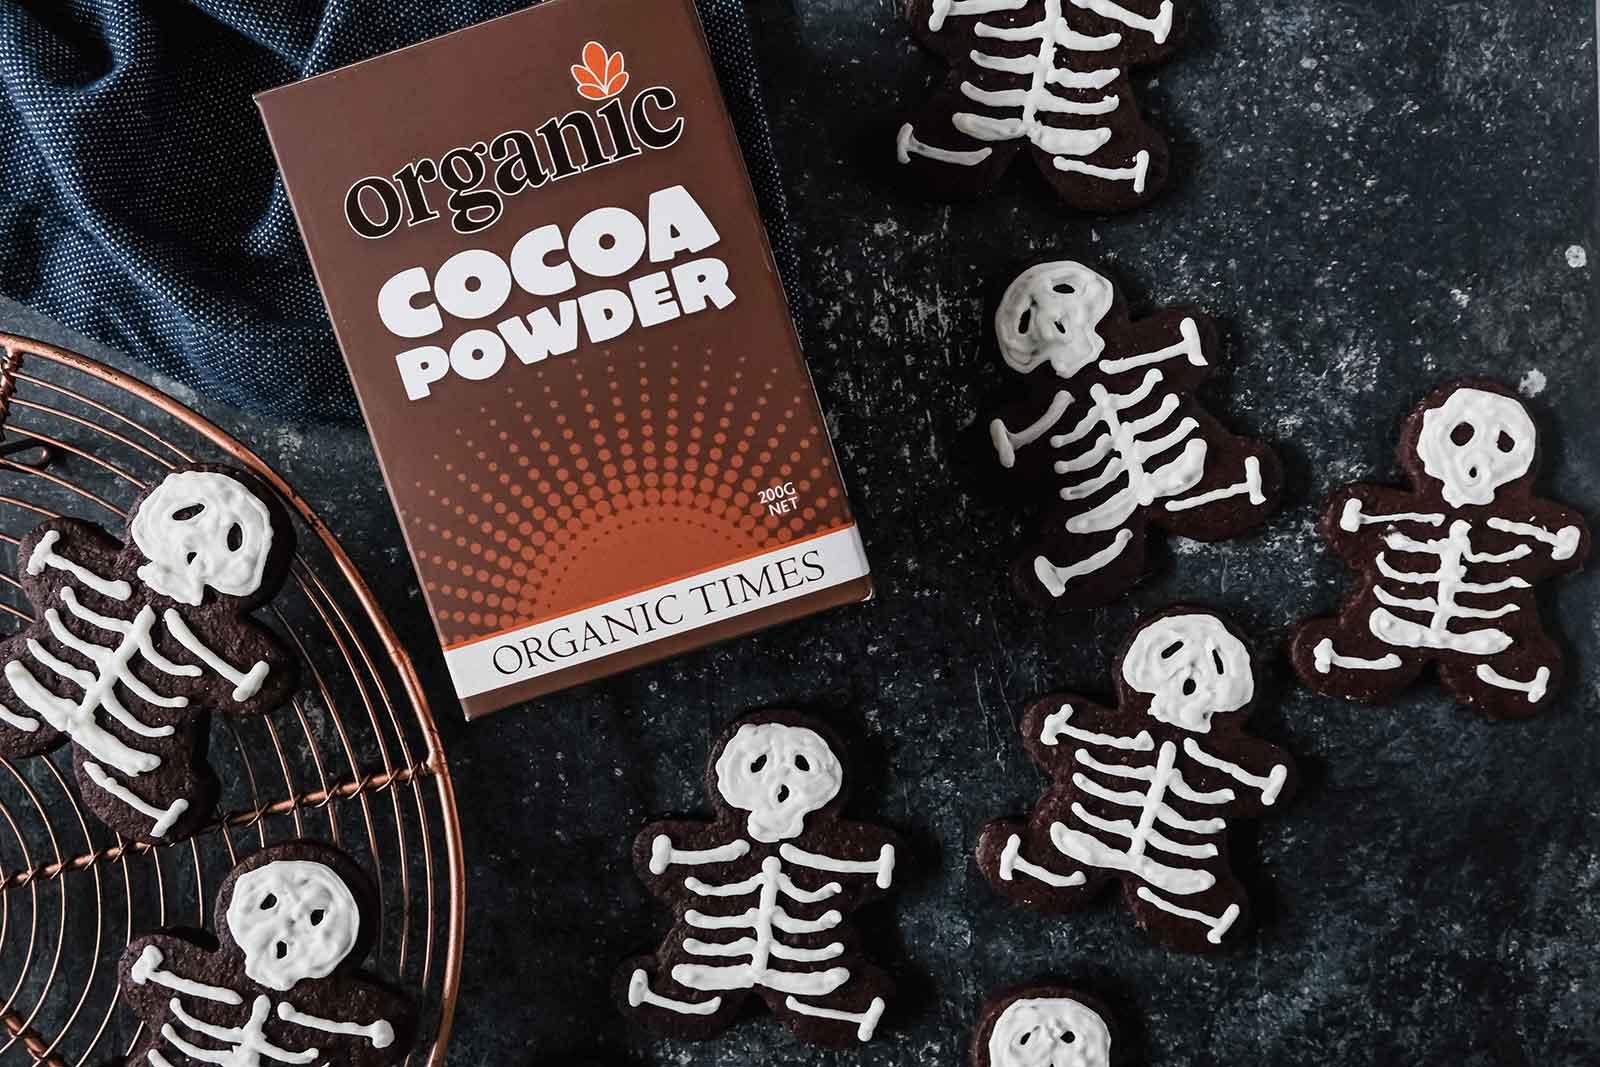 boney brownie halloween cookies next to organic times cocoa powder